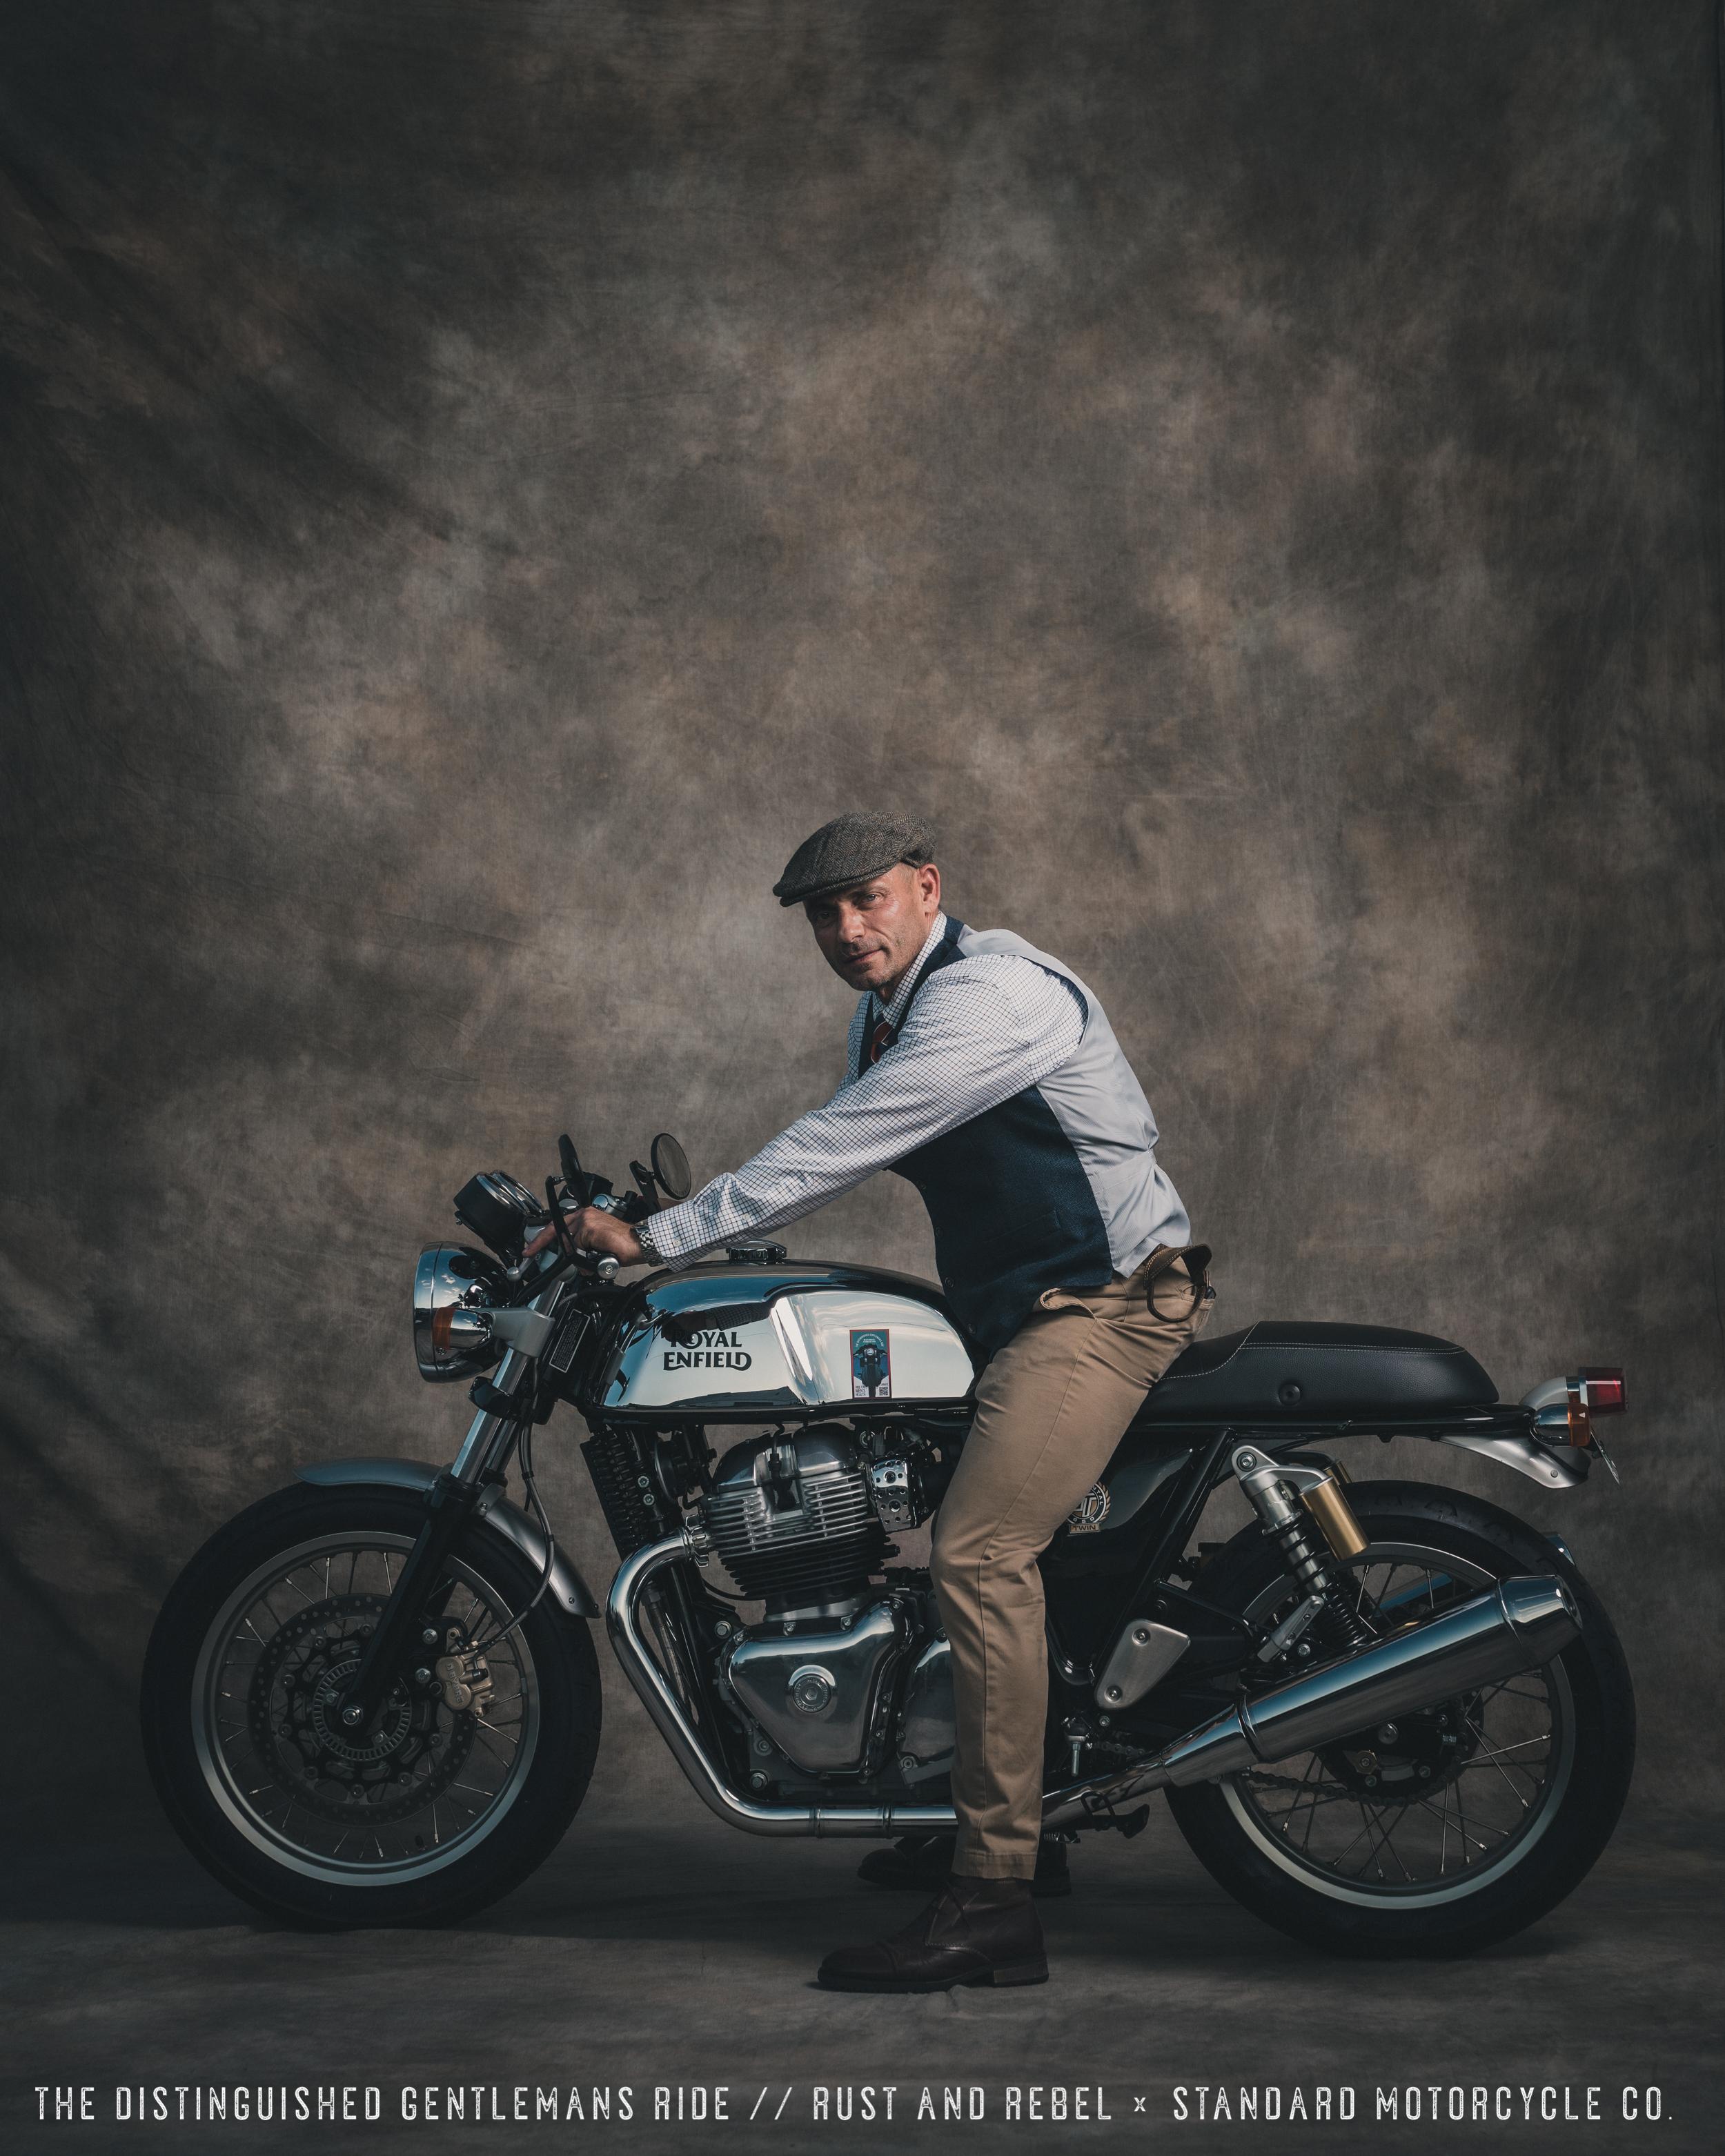 The Distinguished Gentleman's Ride 2019 [PEOPLE - PHOTO BY @MIKEDUNNUSA] - 0113.jpg